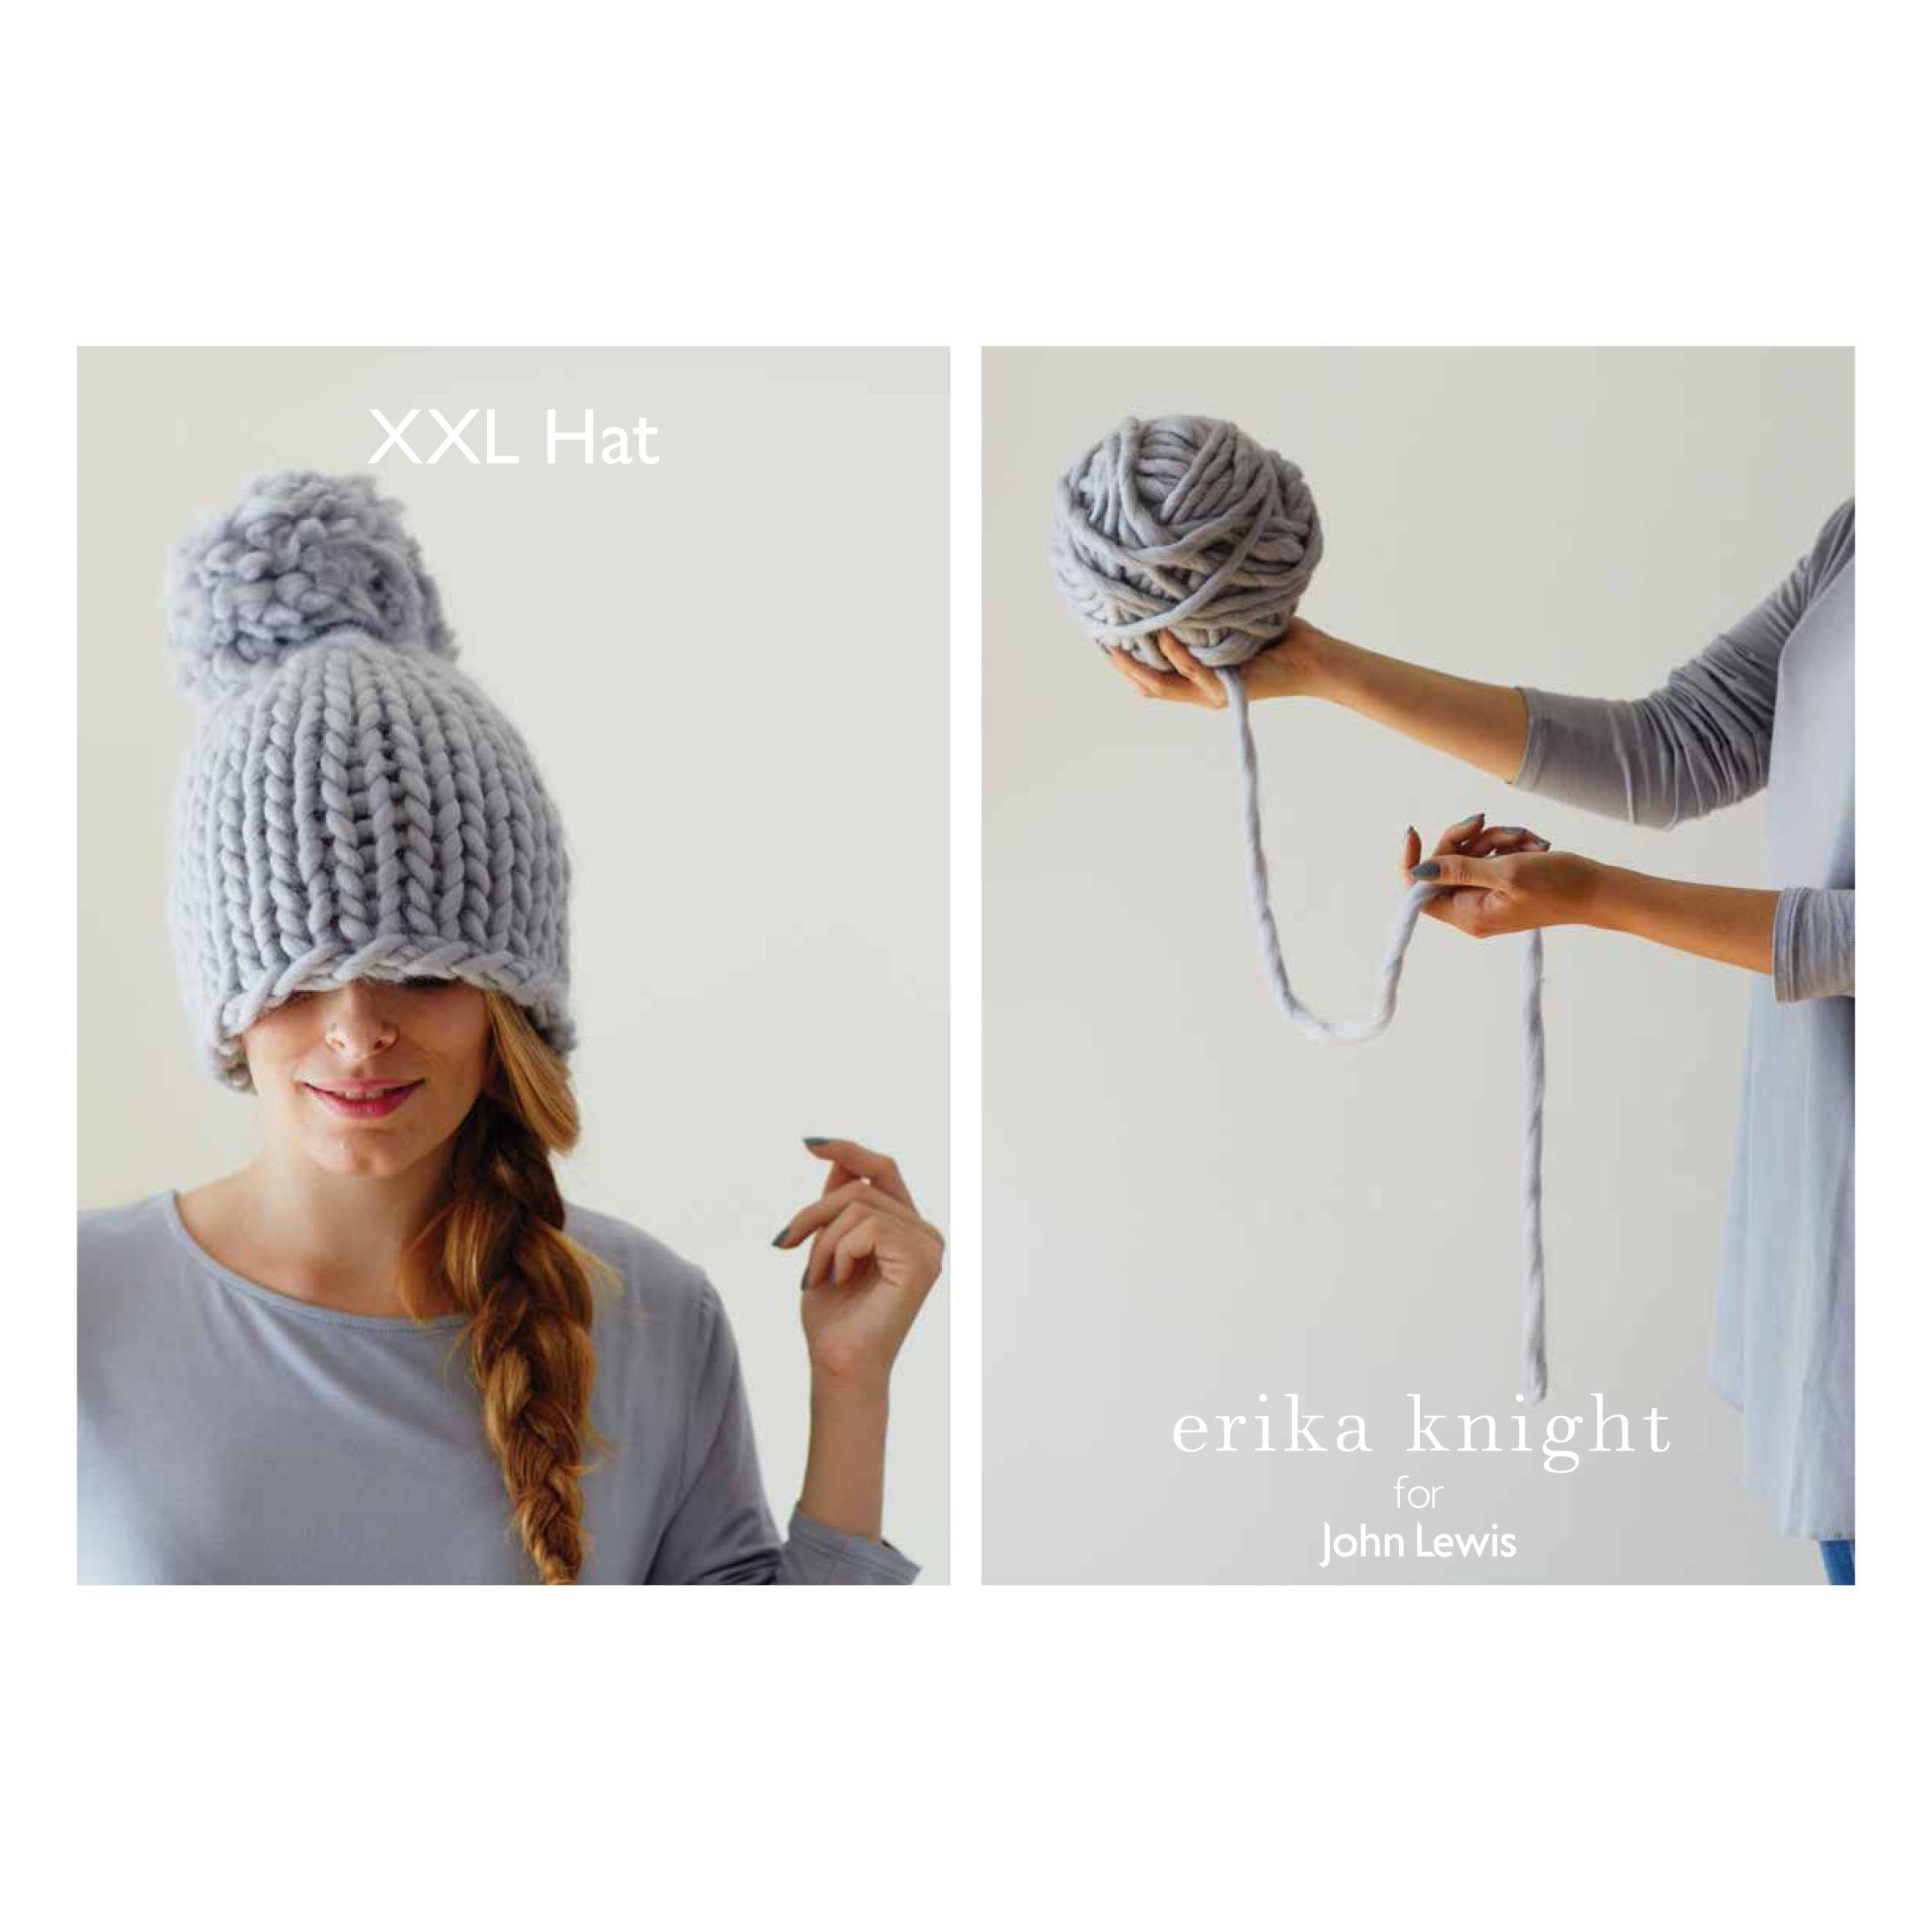 Erika Knight for John Lewis Erika Knight for John Lewis XXL Pom Pom Hat Knitting Pattern